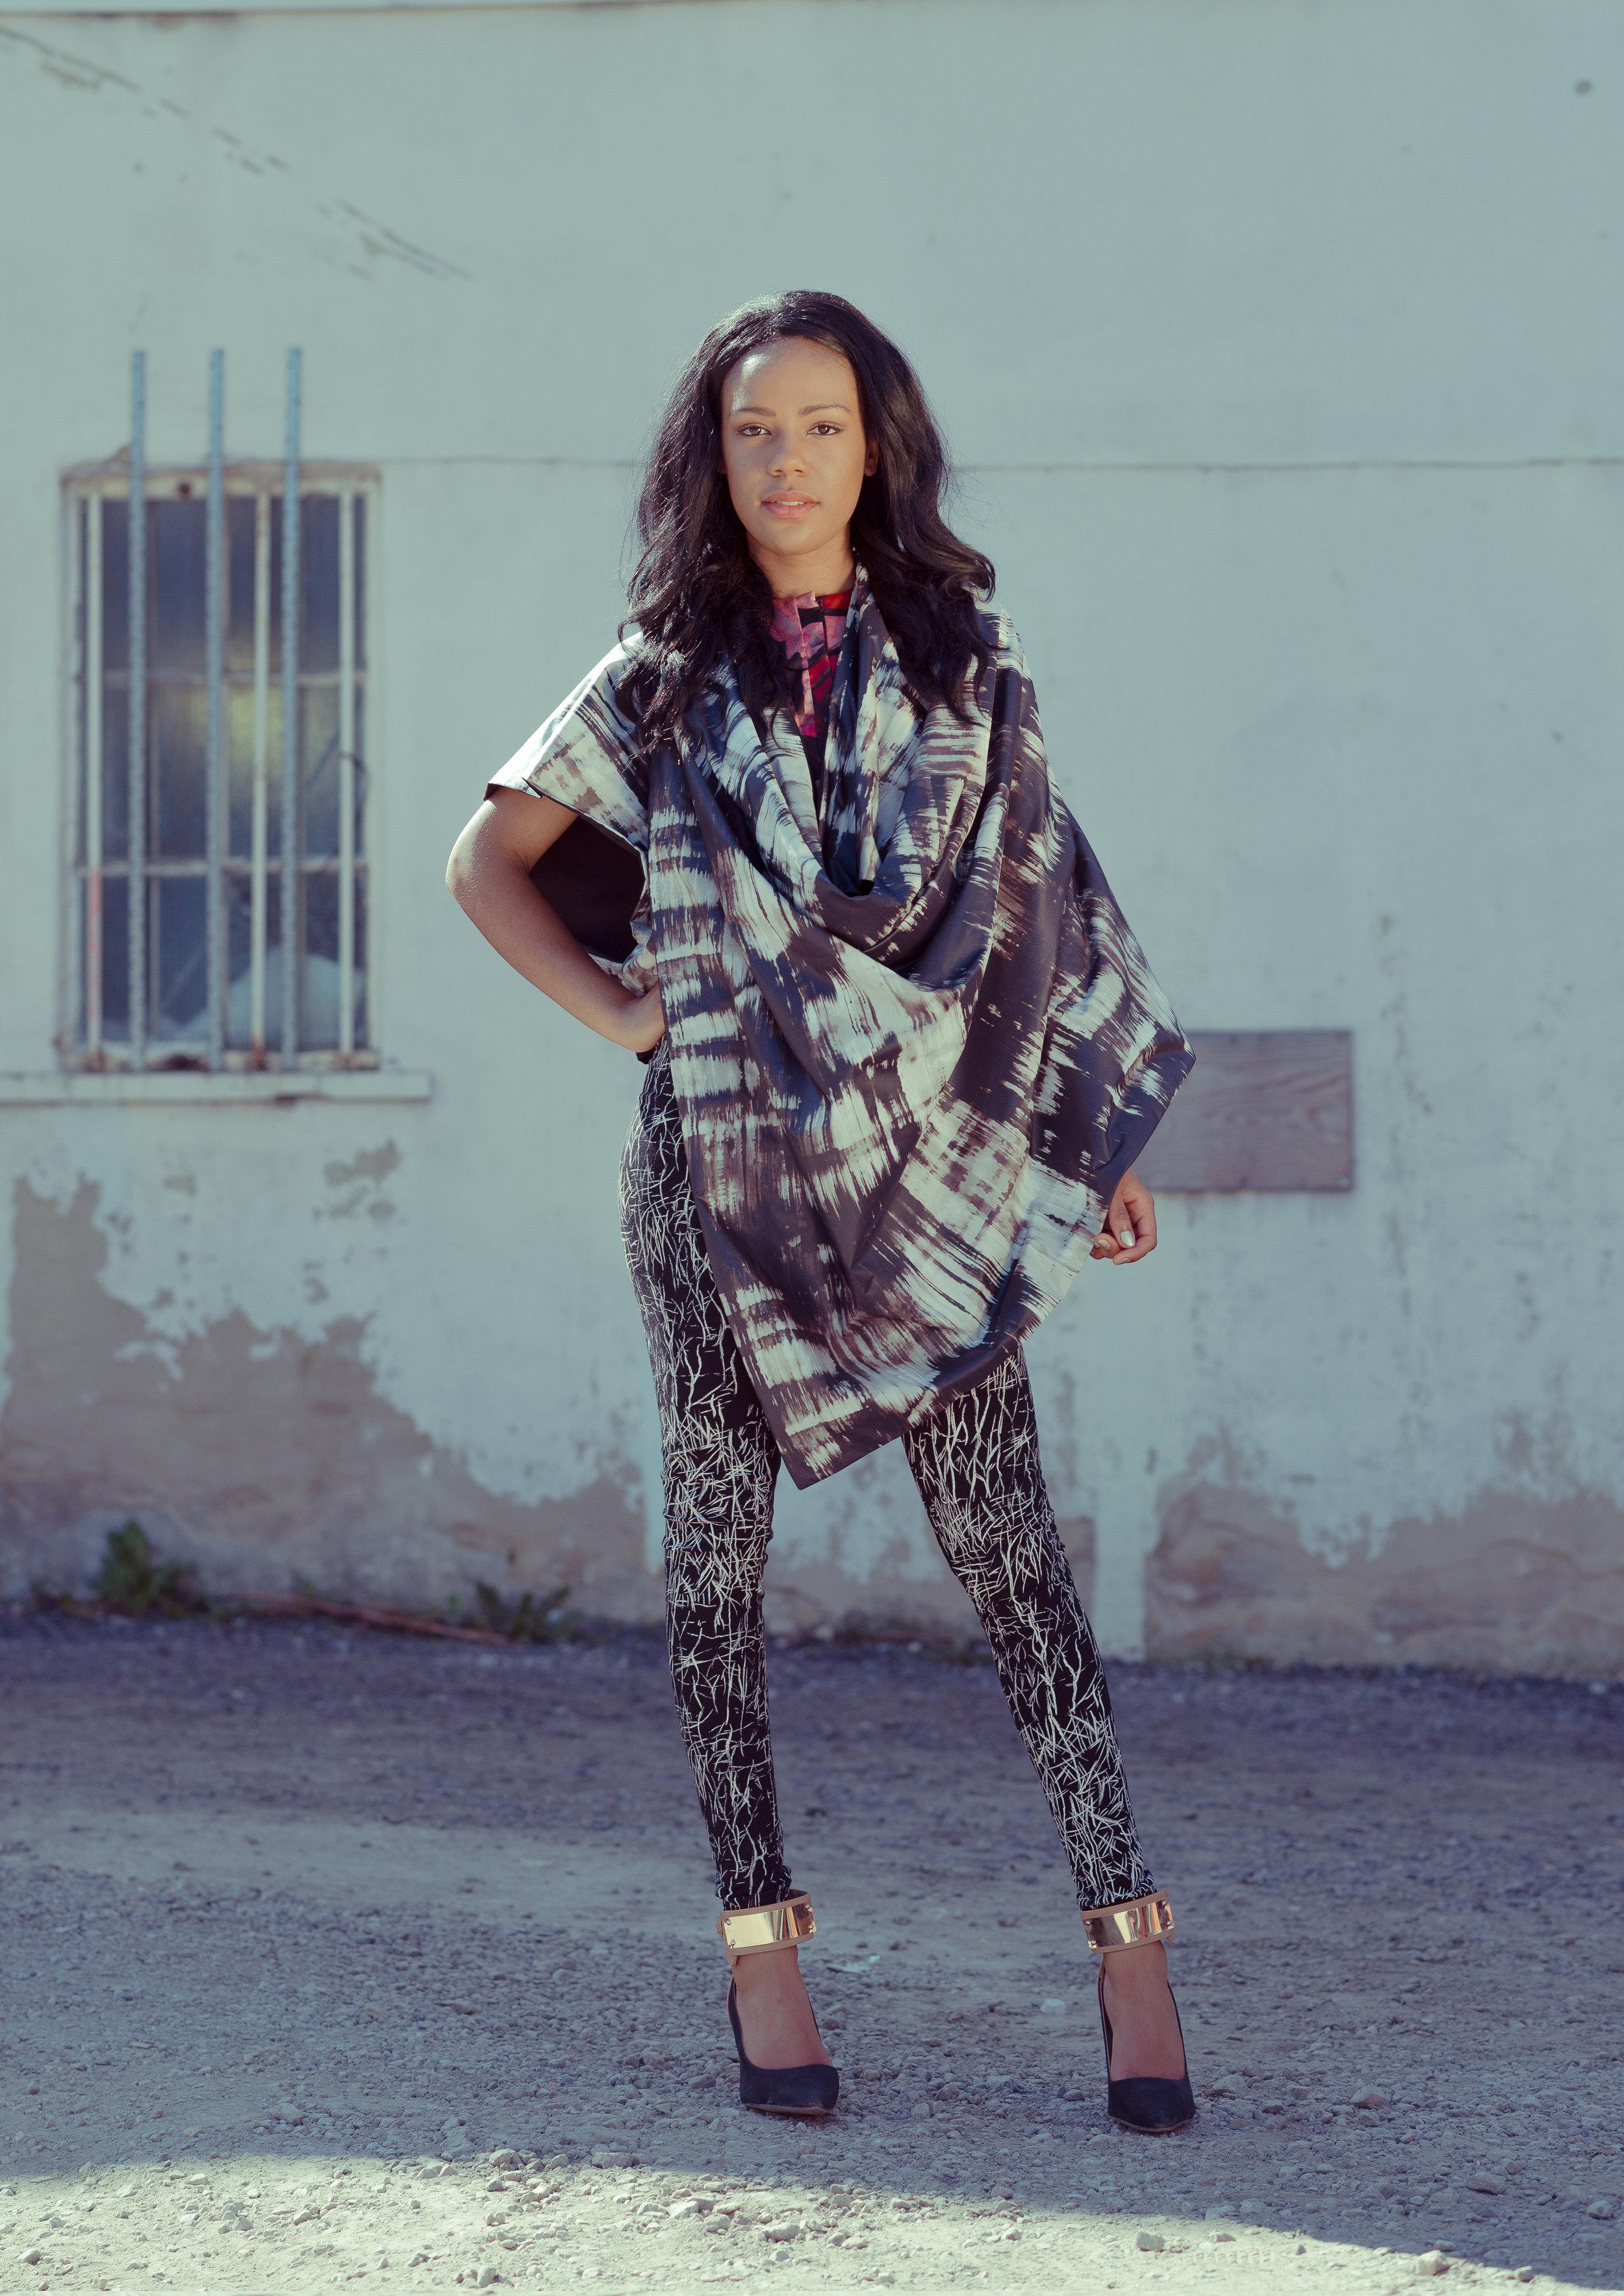 zaramia-ava-zaramiaava-leeds-fashion-designer-ethical-sustainable-tailored-minimalist-cape-grey-black-print-rei-leggigs-black-jacket-belt-point-skirt-versatile-drape-cowl-styling-womenswear-models-10